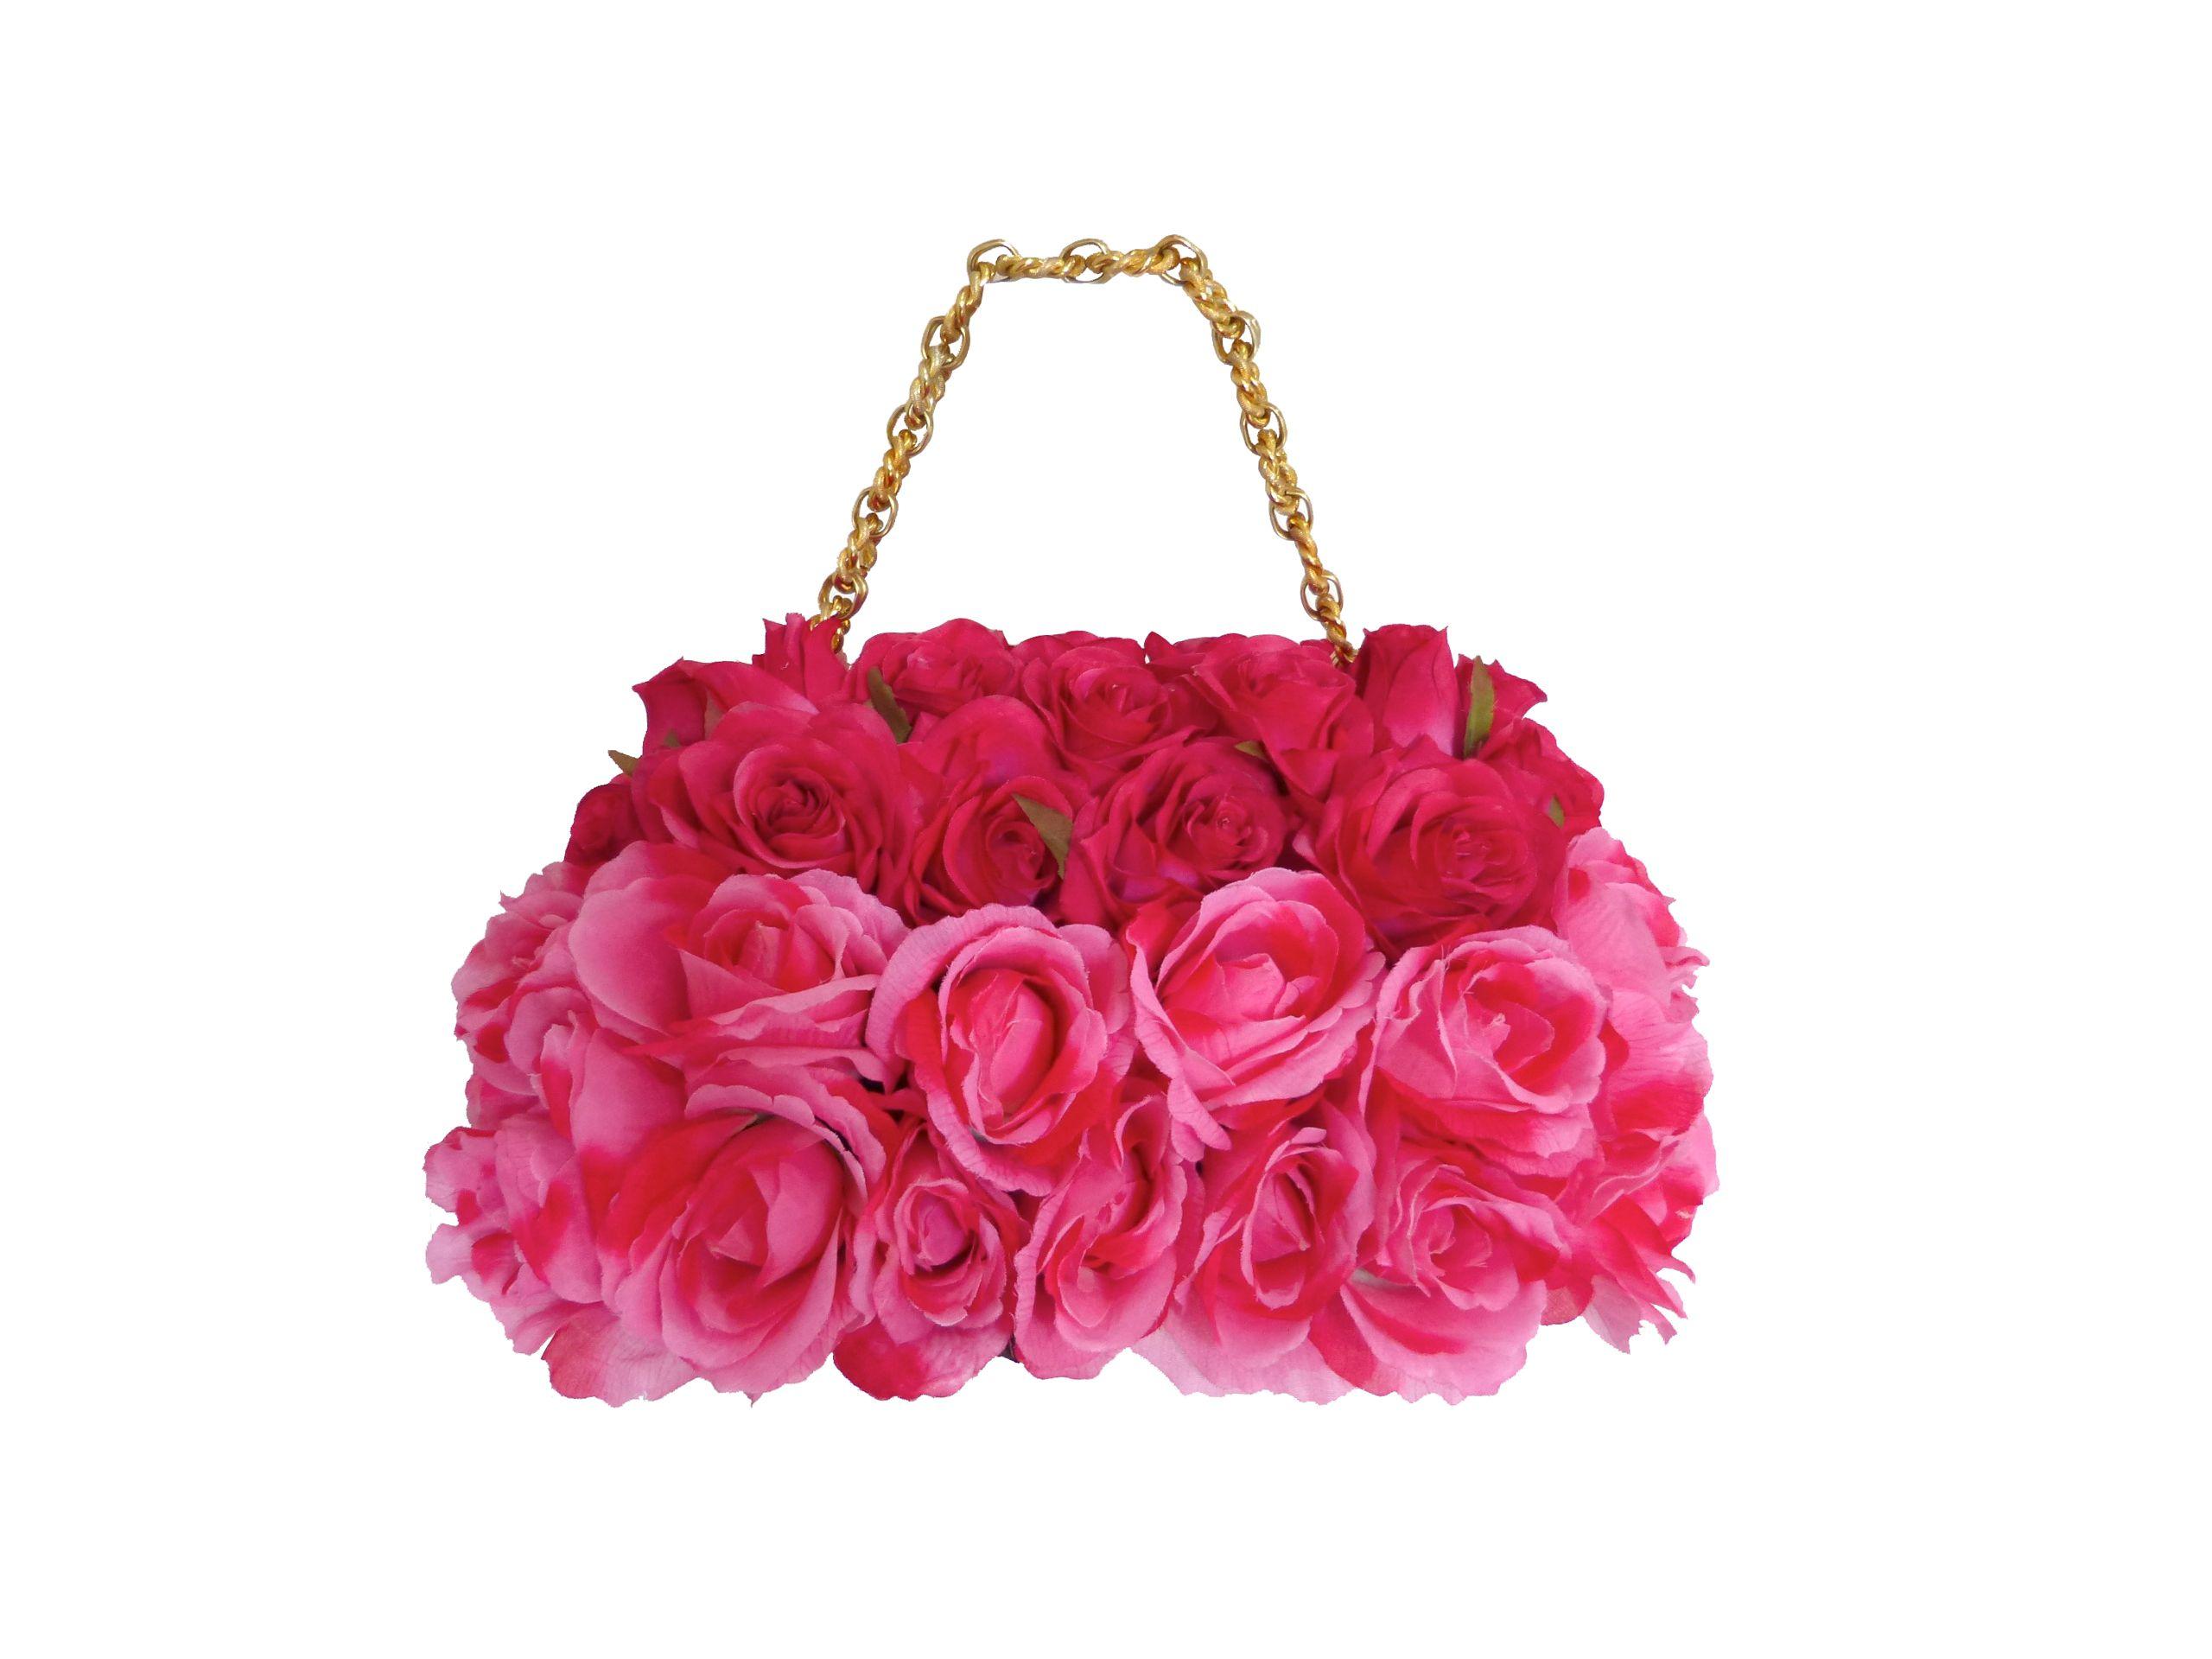 BETTINA SPITZ Cartera de rosas